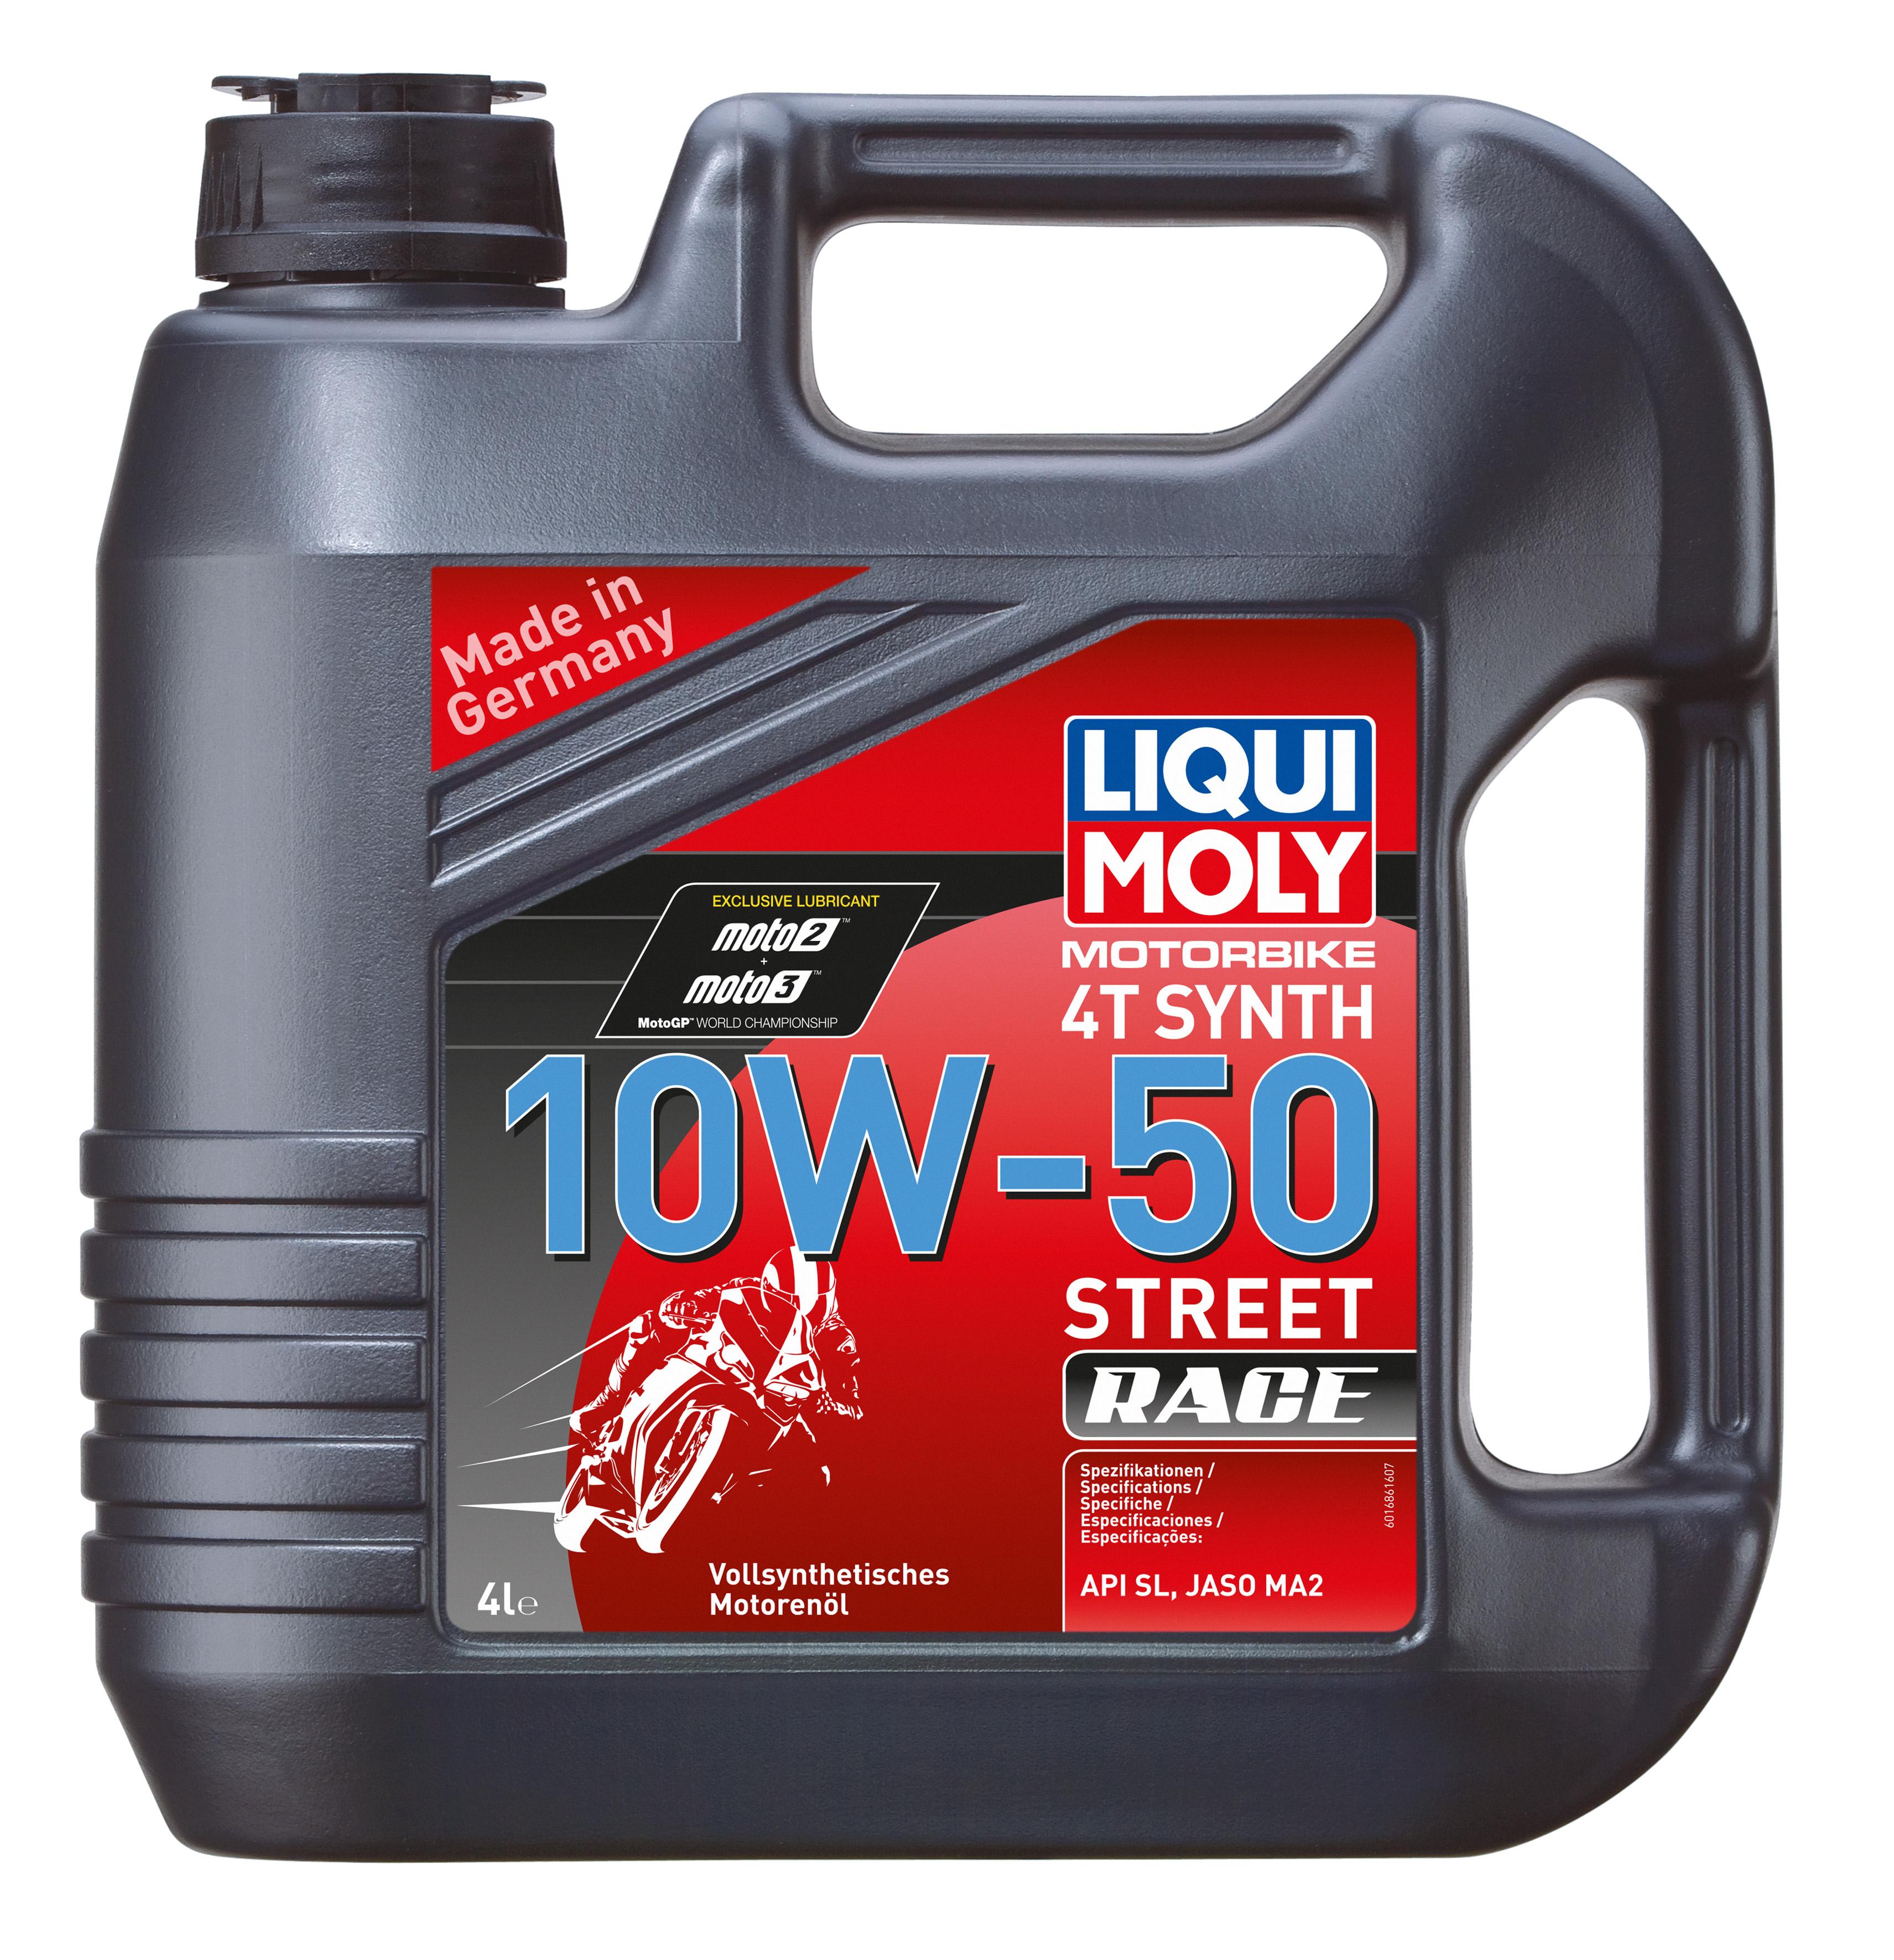 Produkt miesiąca Liqui Moly – oleje motocyklowe